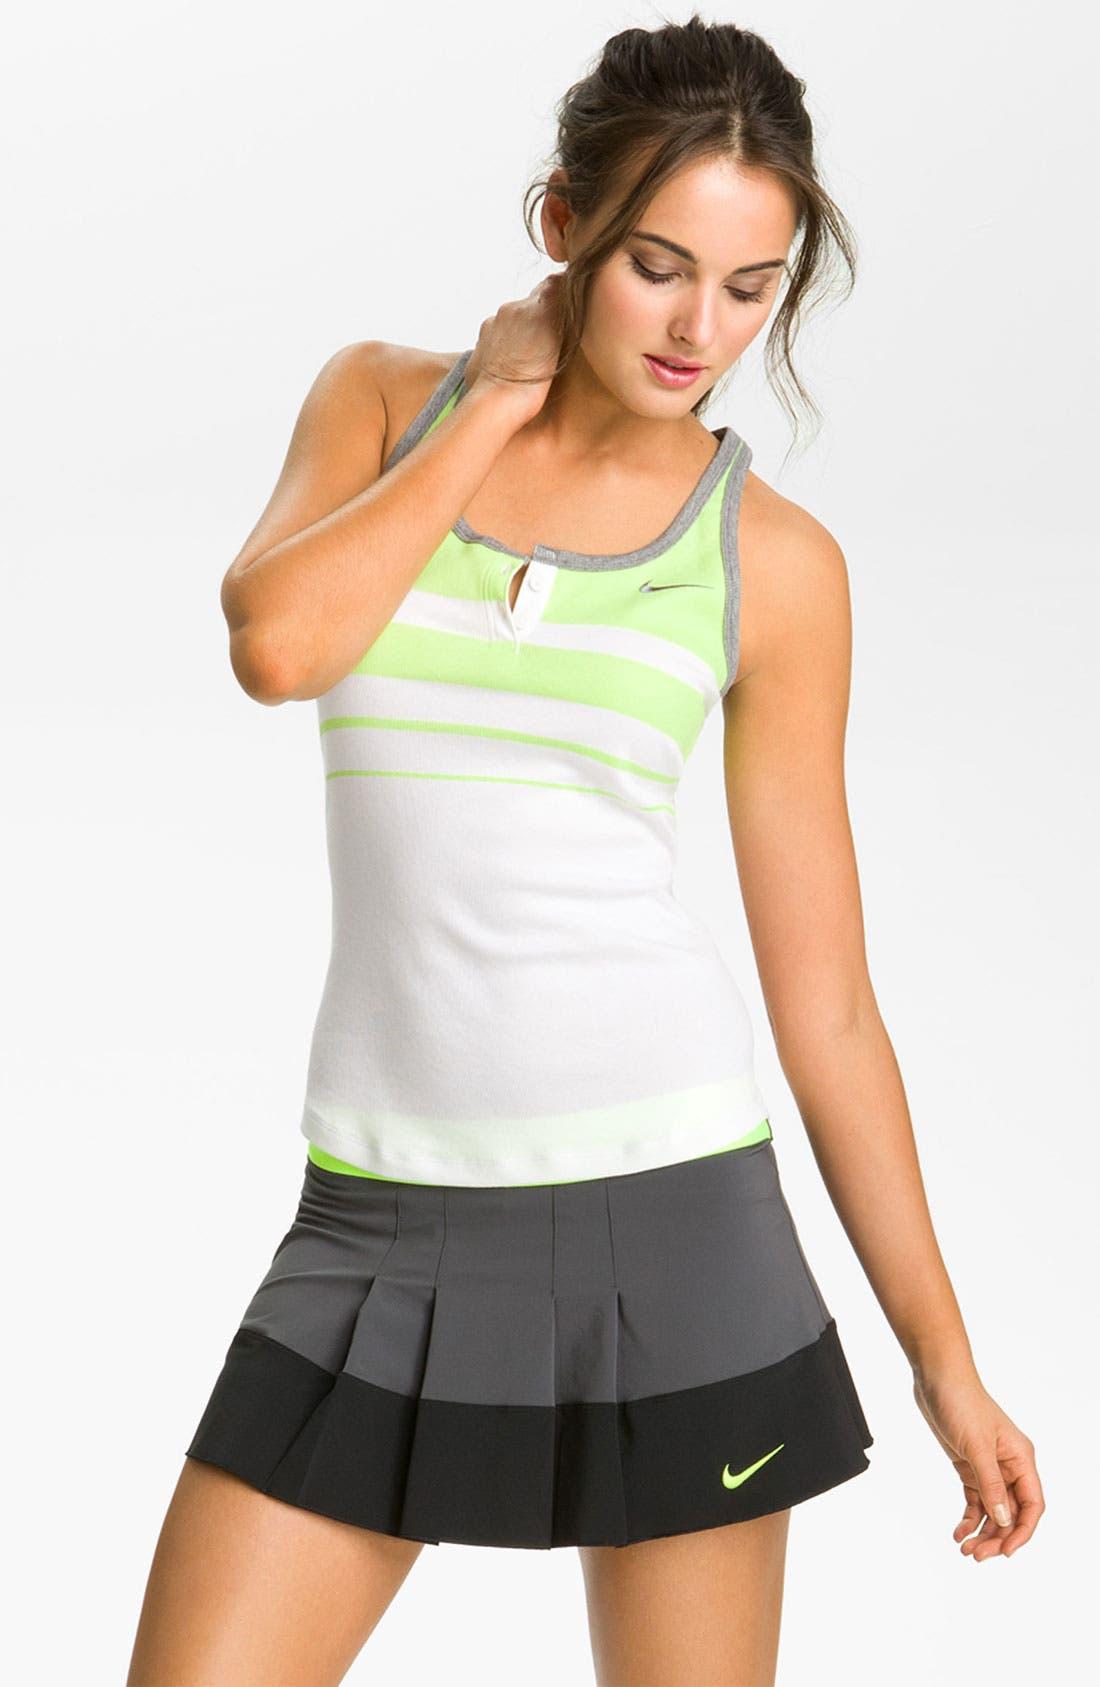 Main Image - Nike Dri-FIT Racerback Tennis Tank